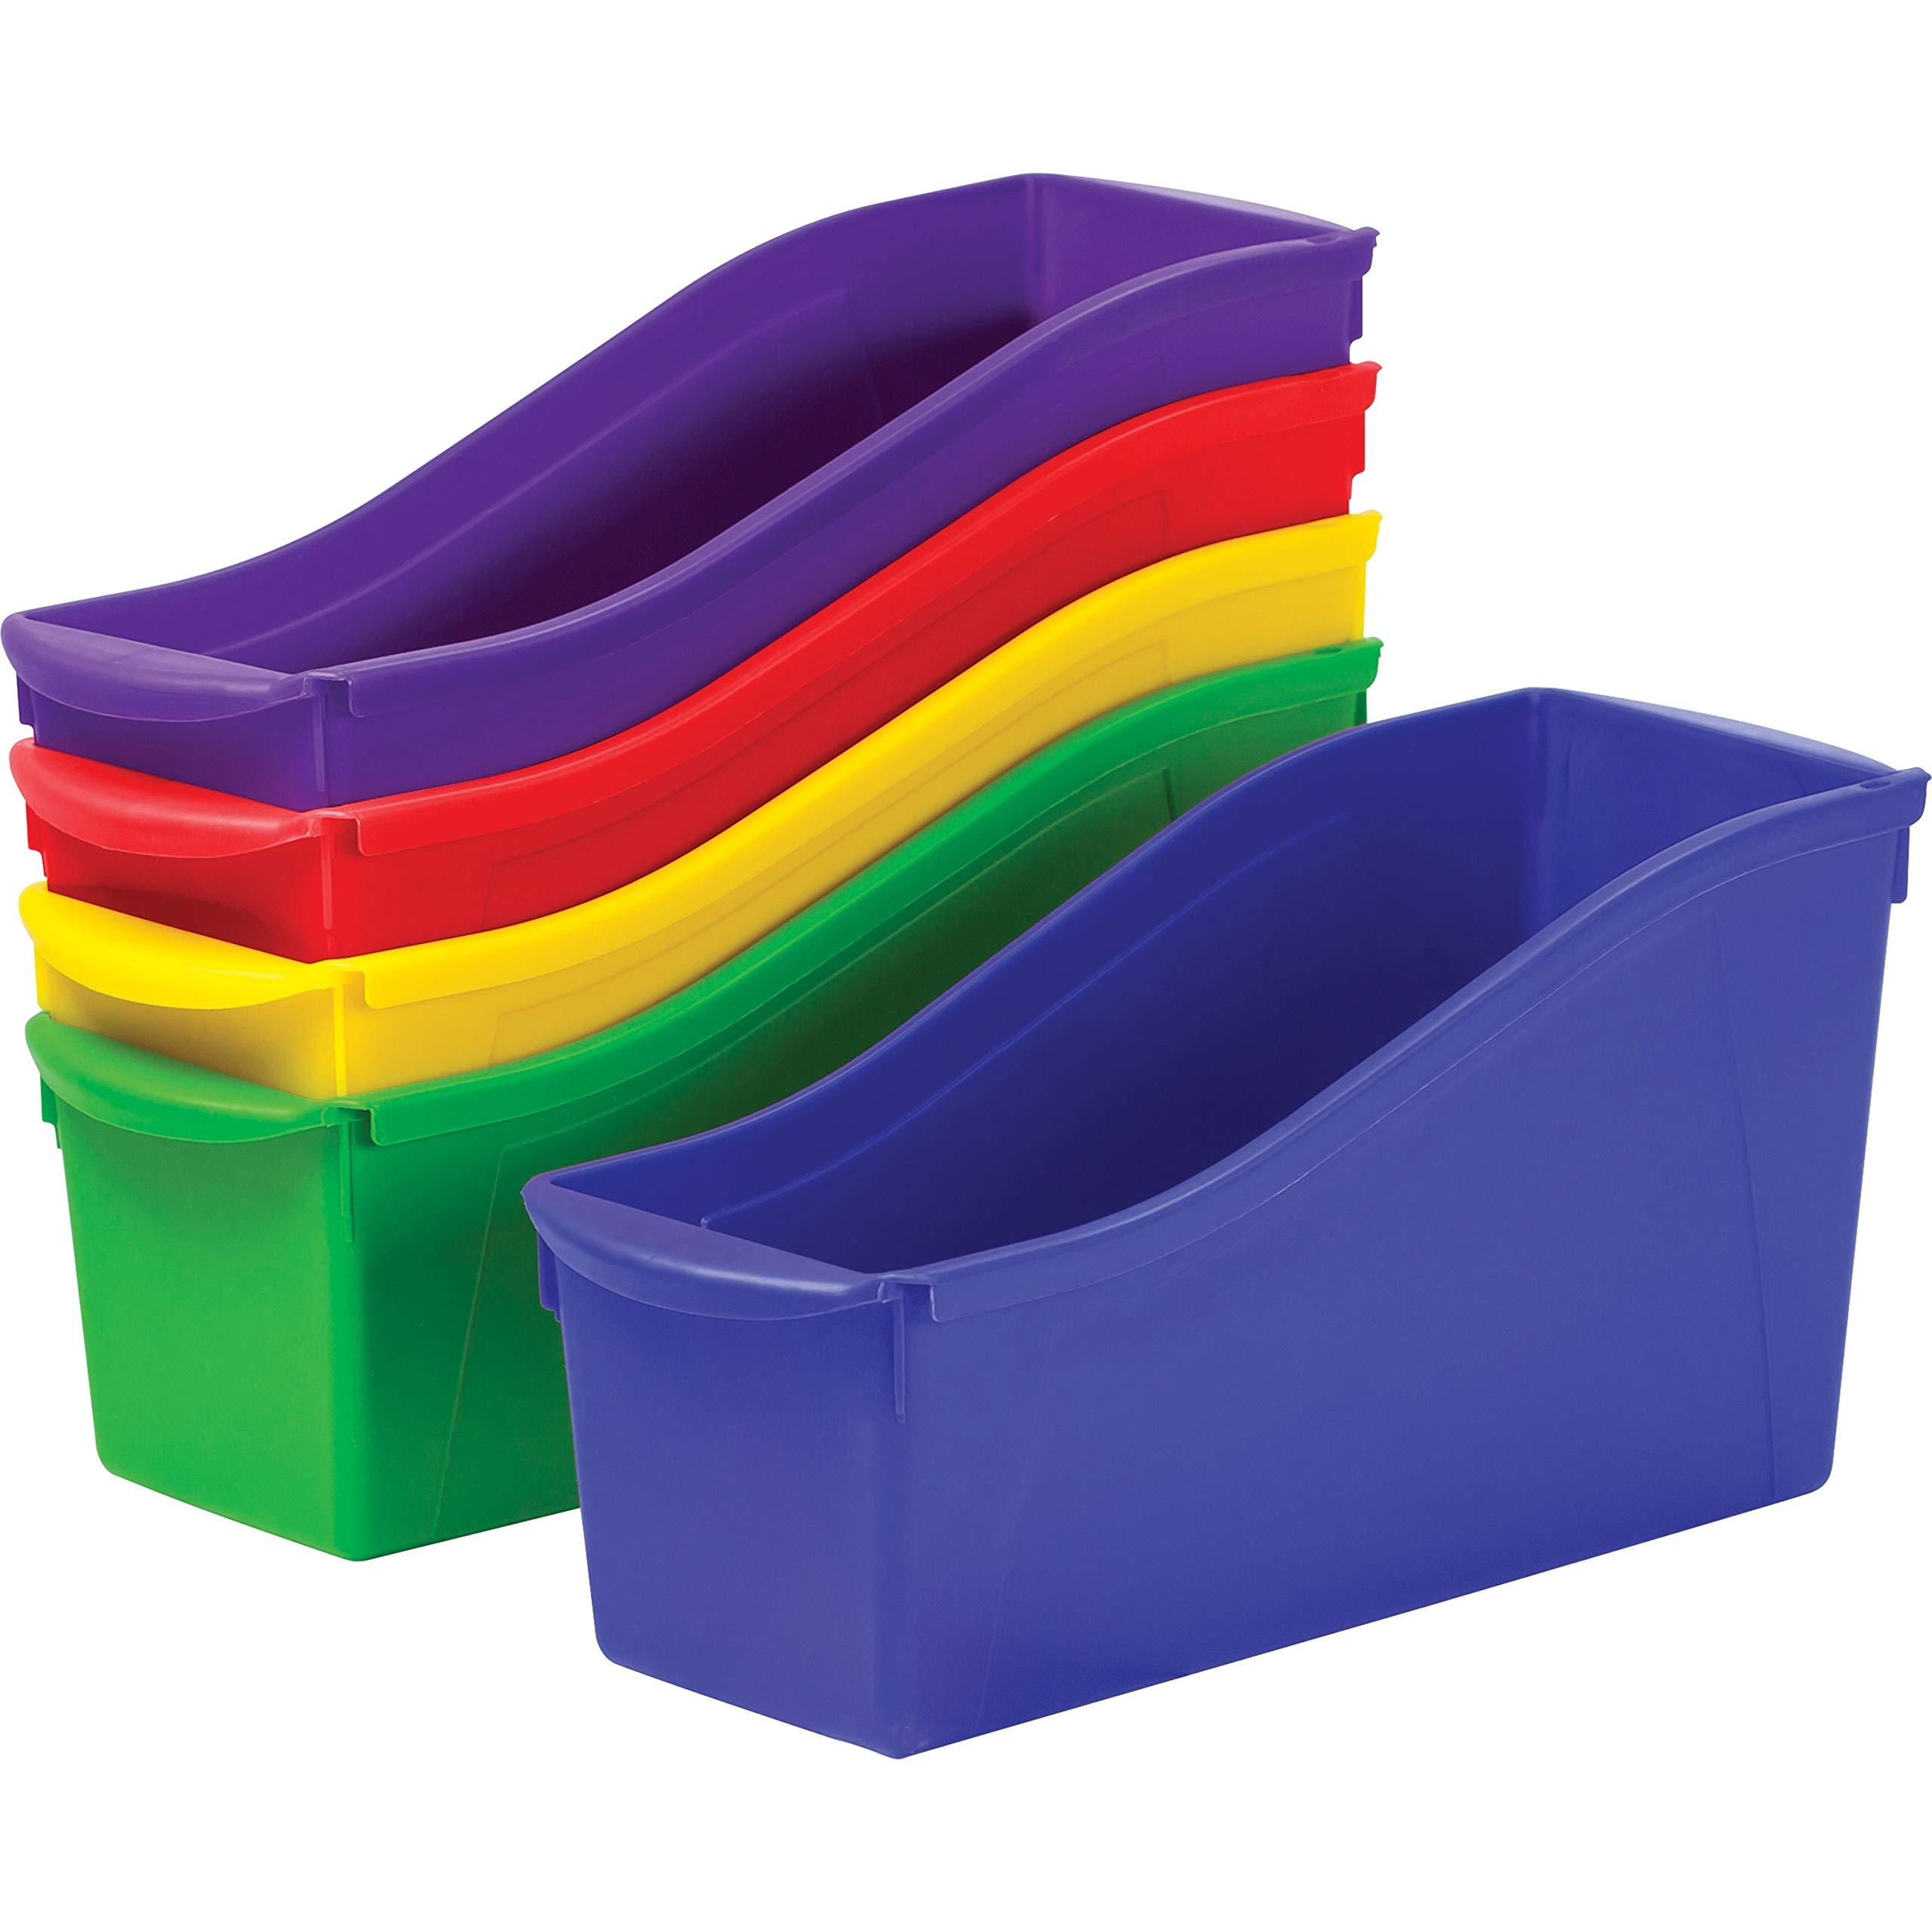 Storex 70105U06C Interlocking Book Bins, 4 3/4 x 12 5/8 x 7, 5 Color Set, Plastic